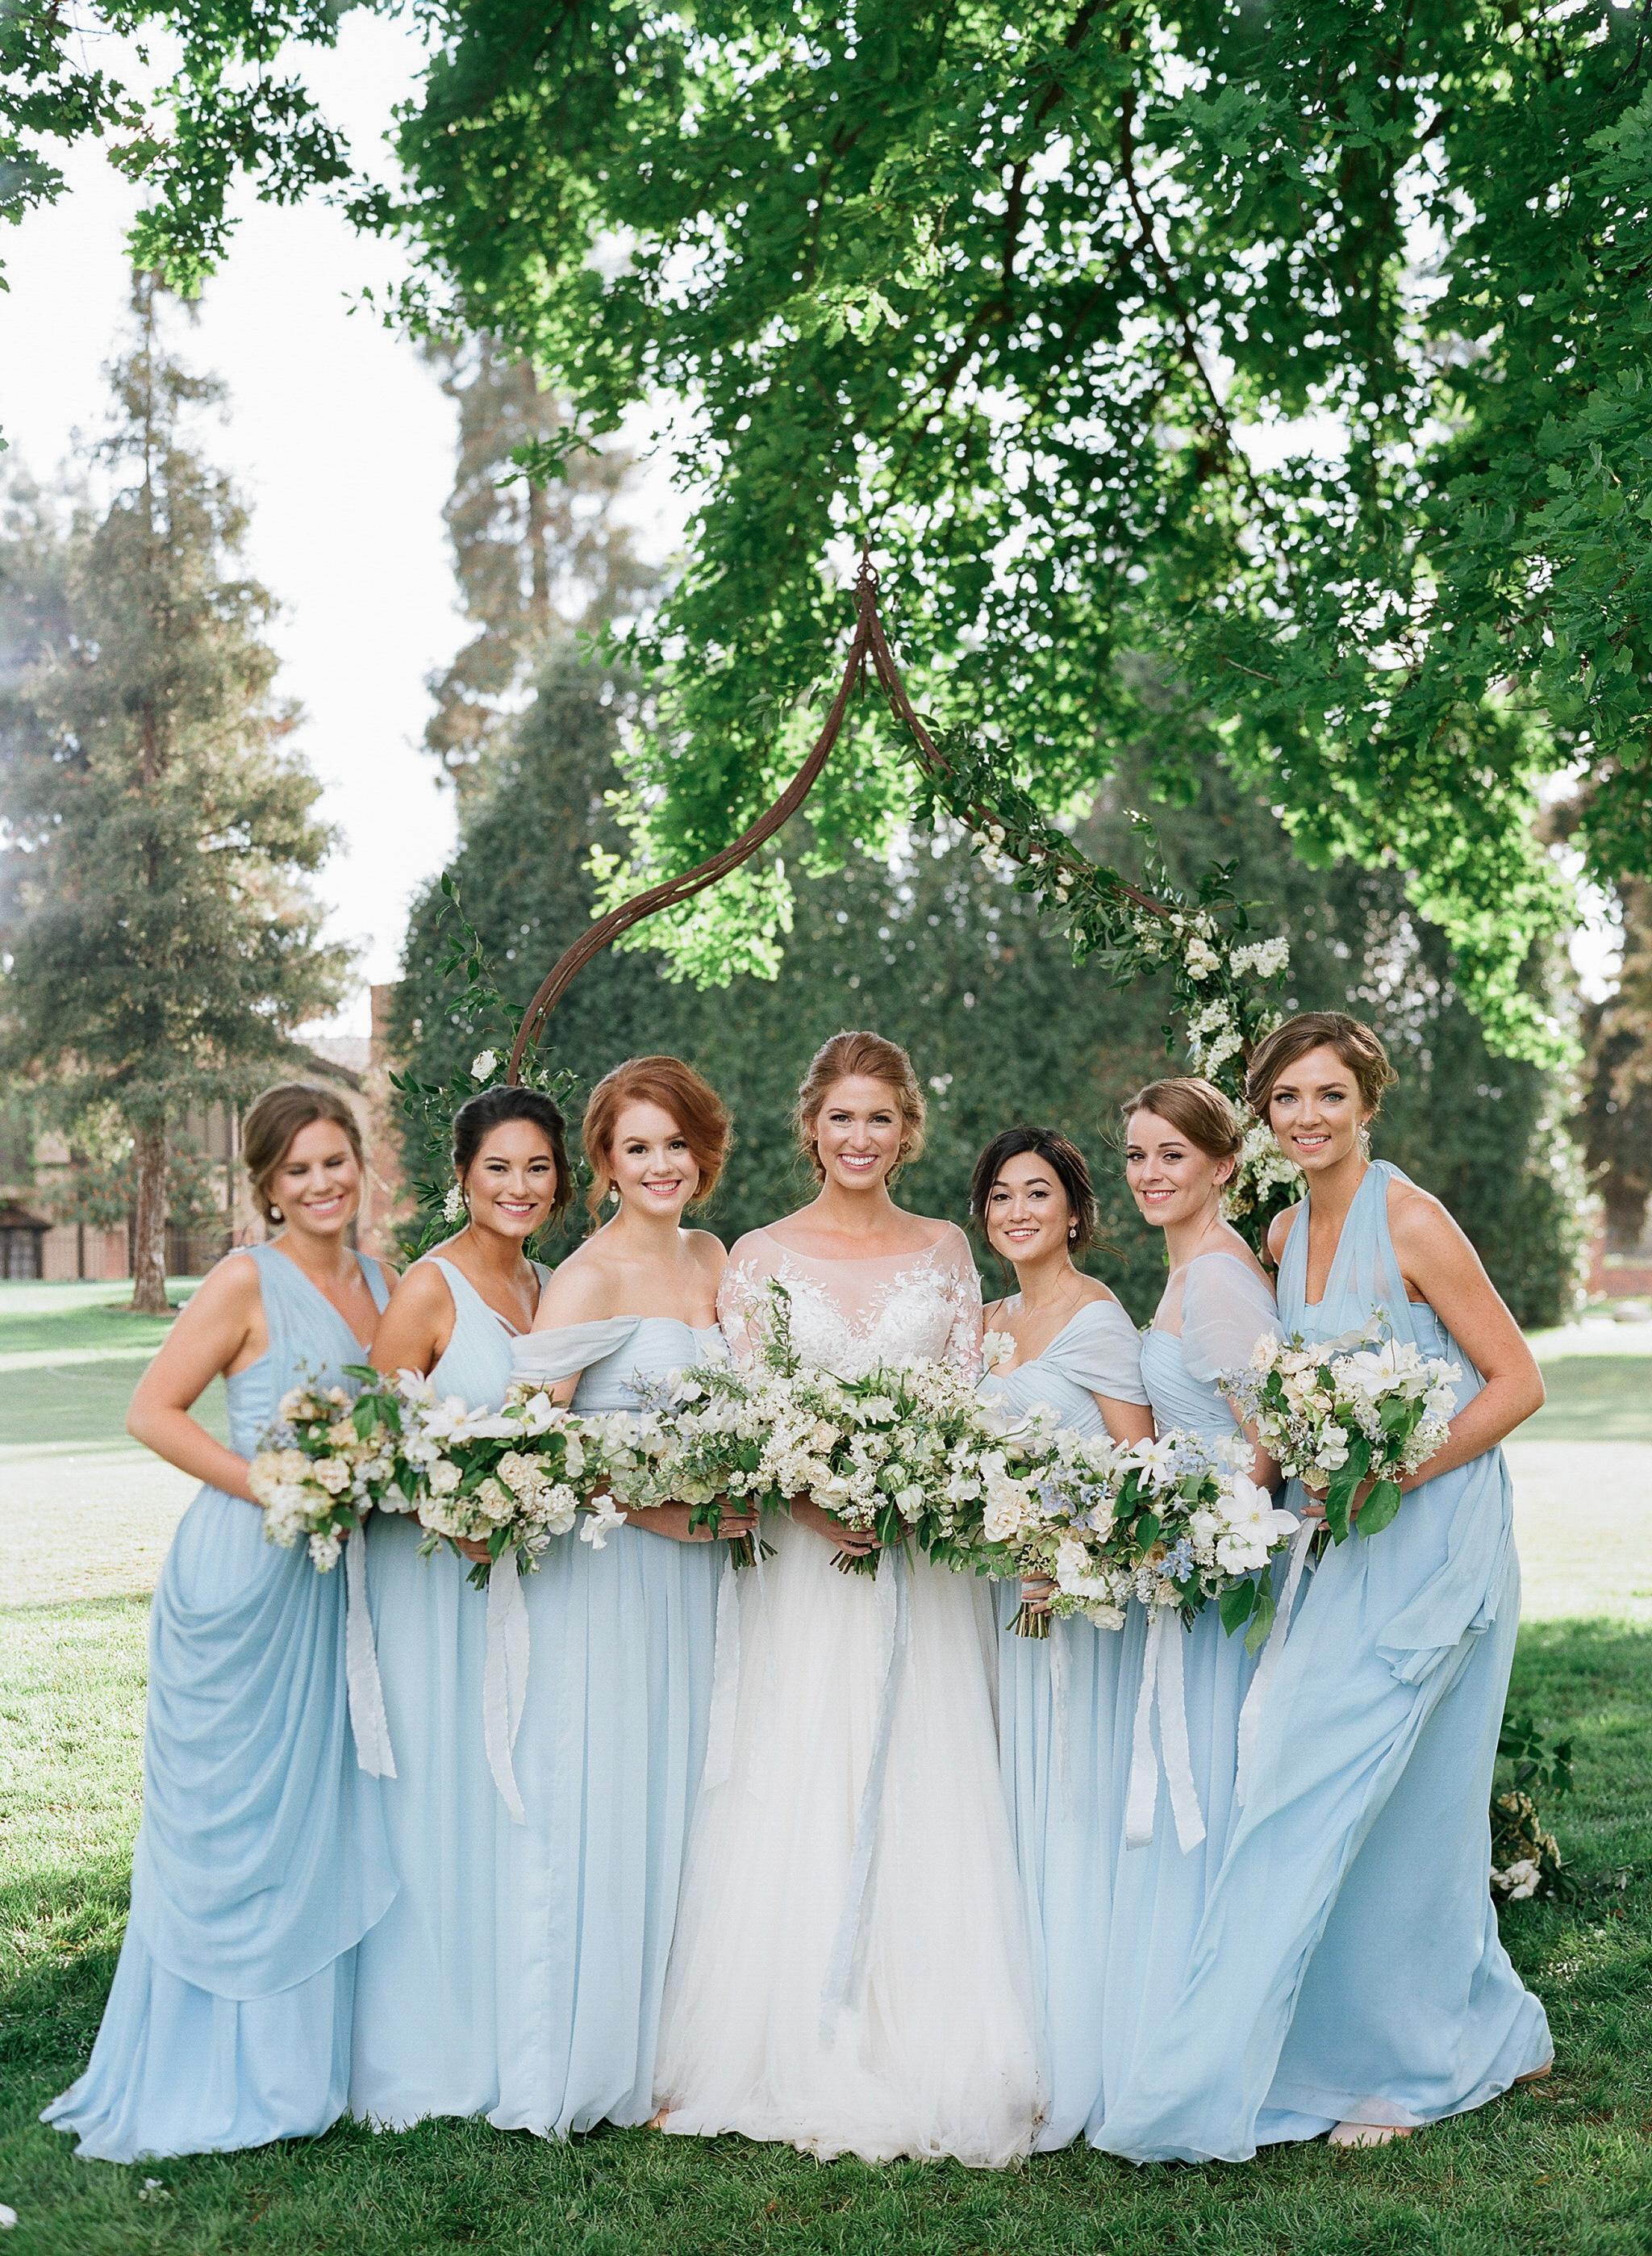 bridesmaids blue dresses